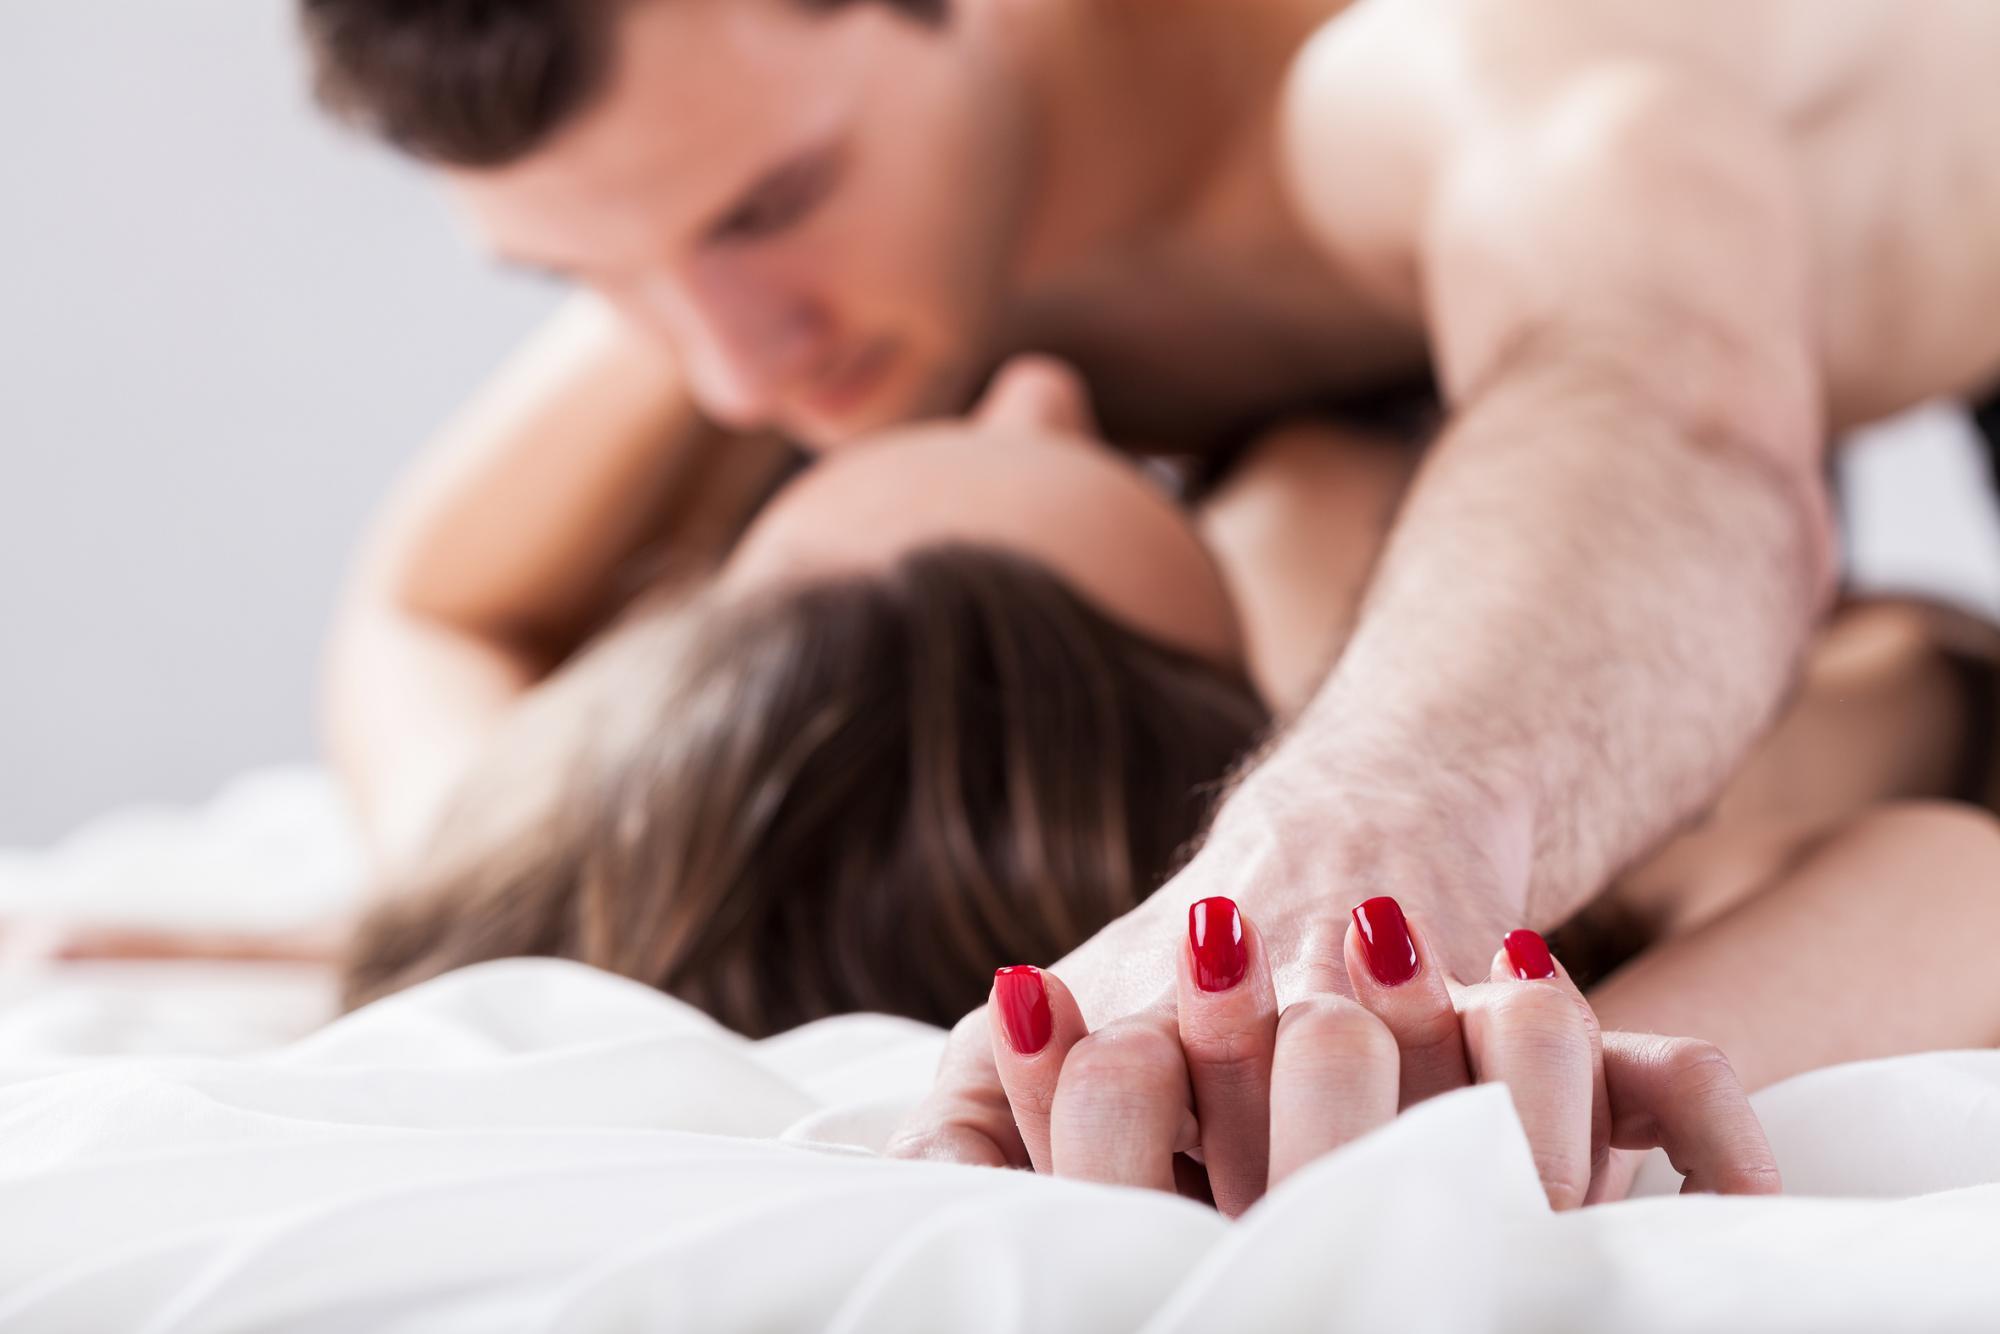 VIDEO SEXE GRATUIT SEXE MODEL GRENOBLE